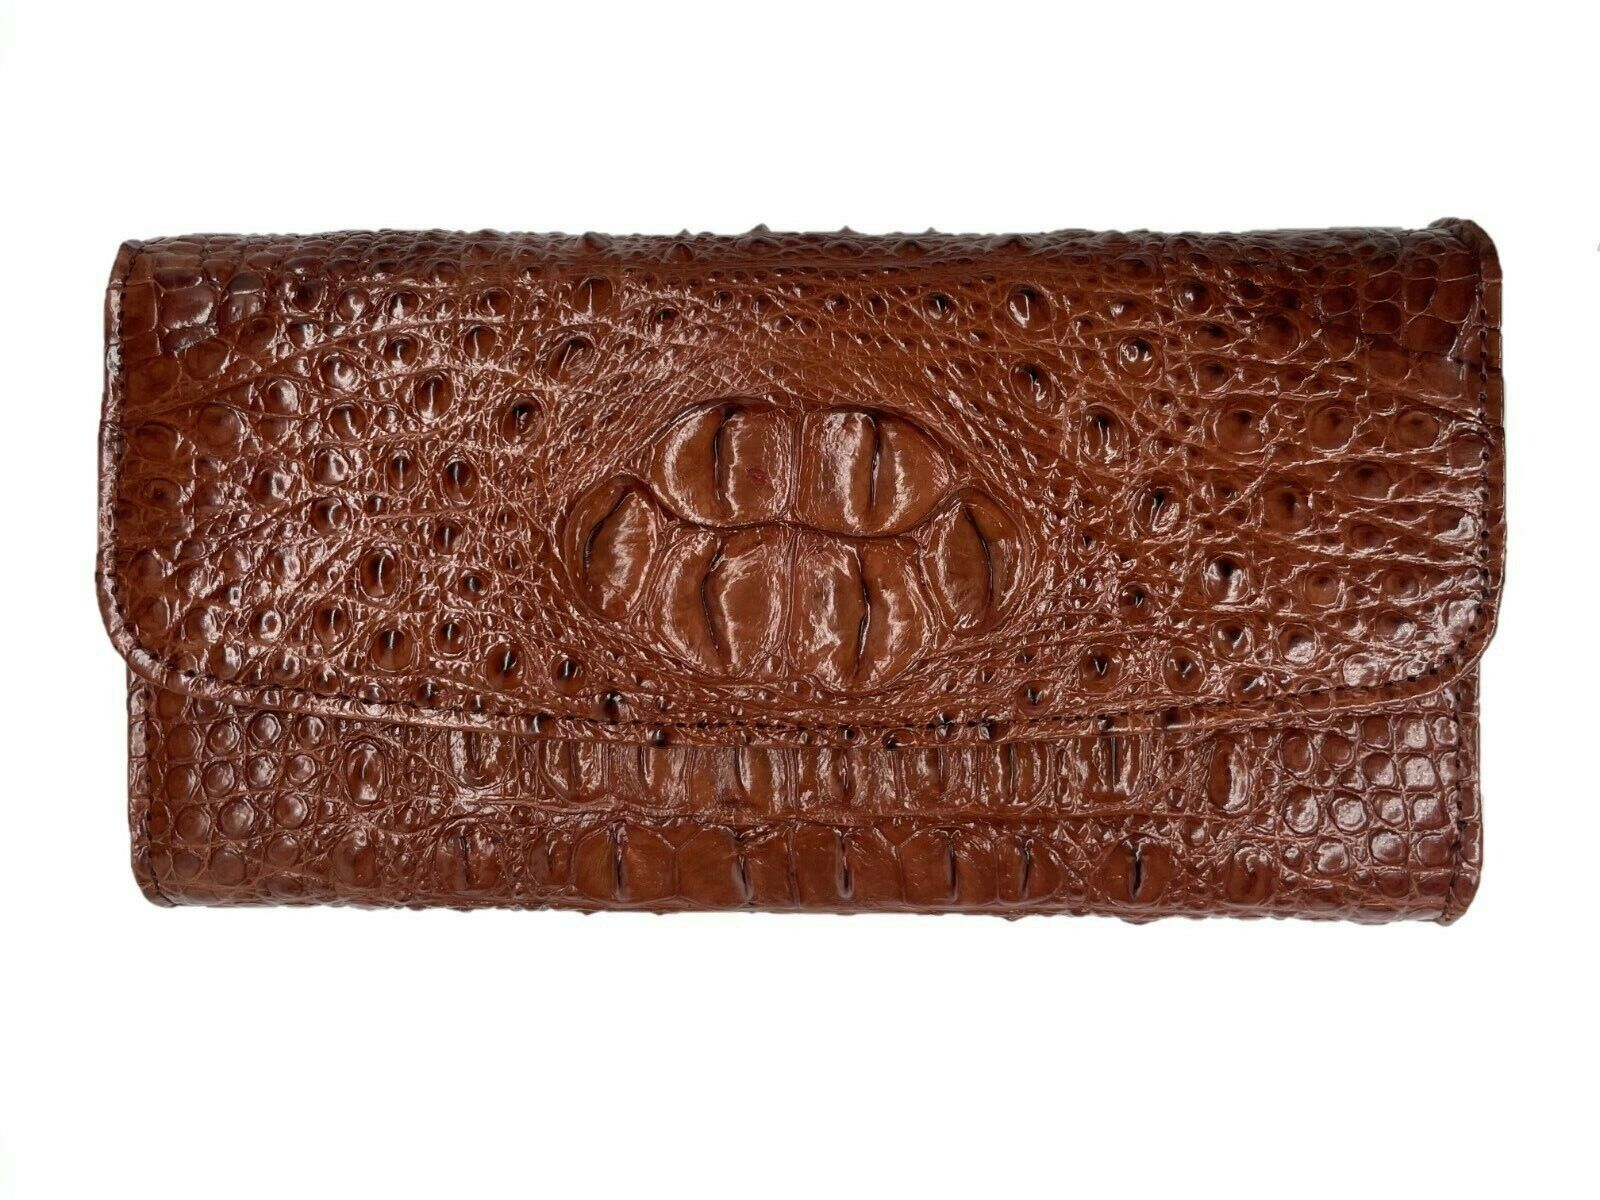 Cognac / Tan Genuine Crocodile Alligator Trifold Women's Wallet / Clutch